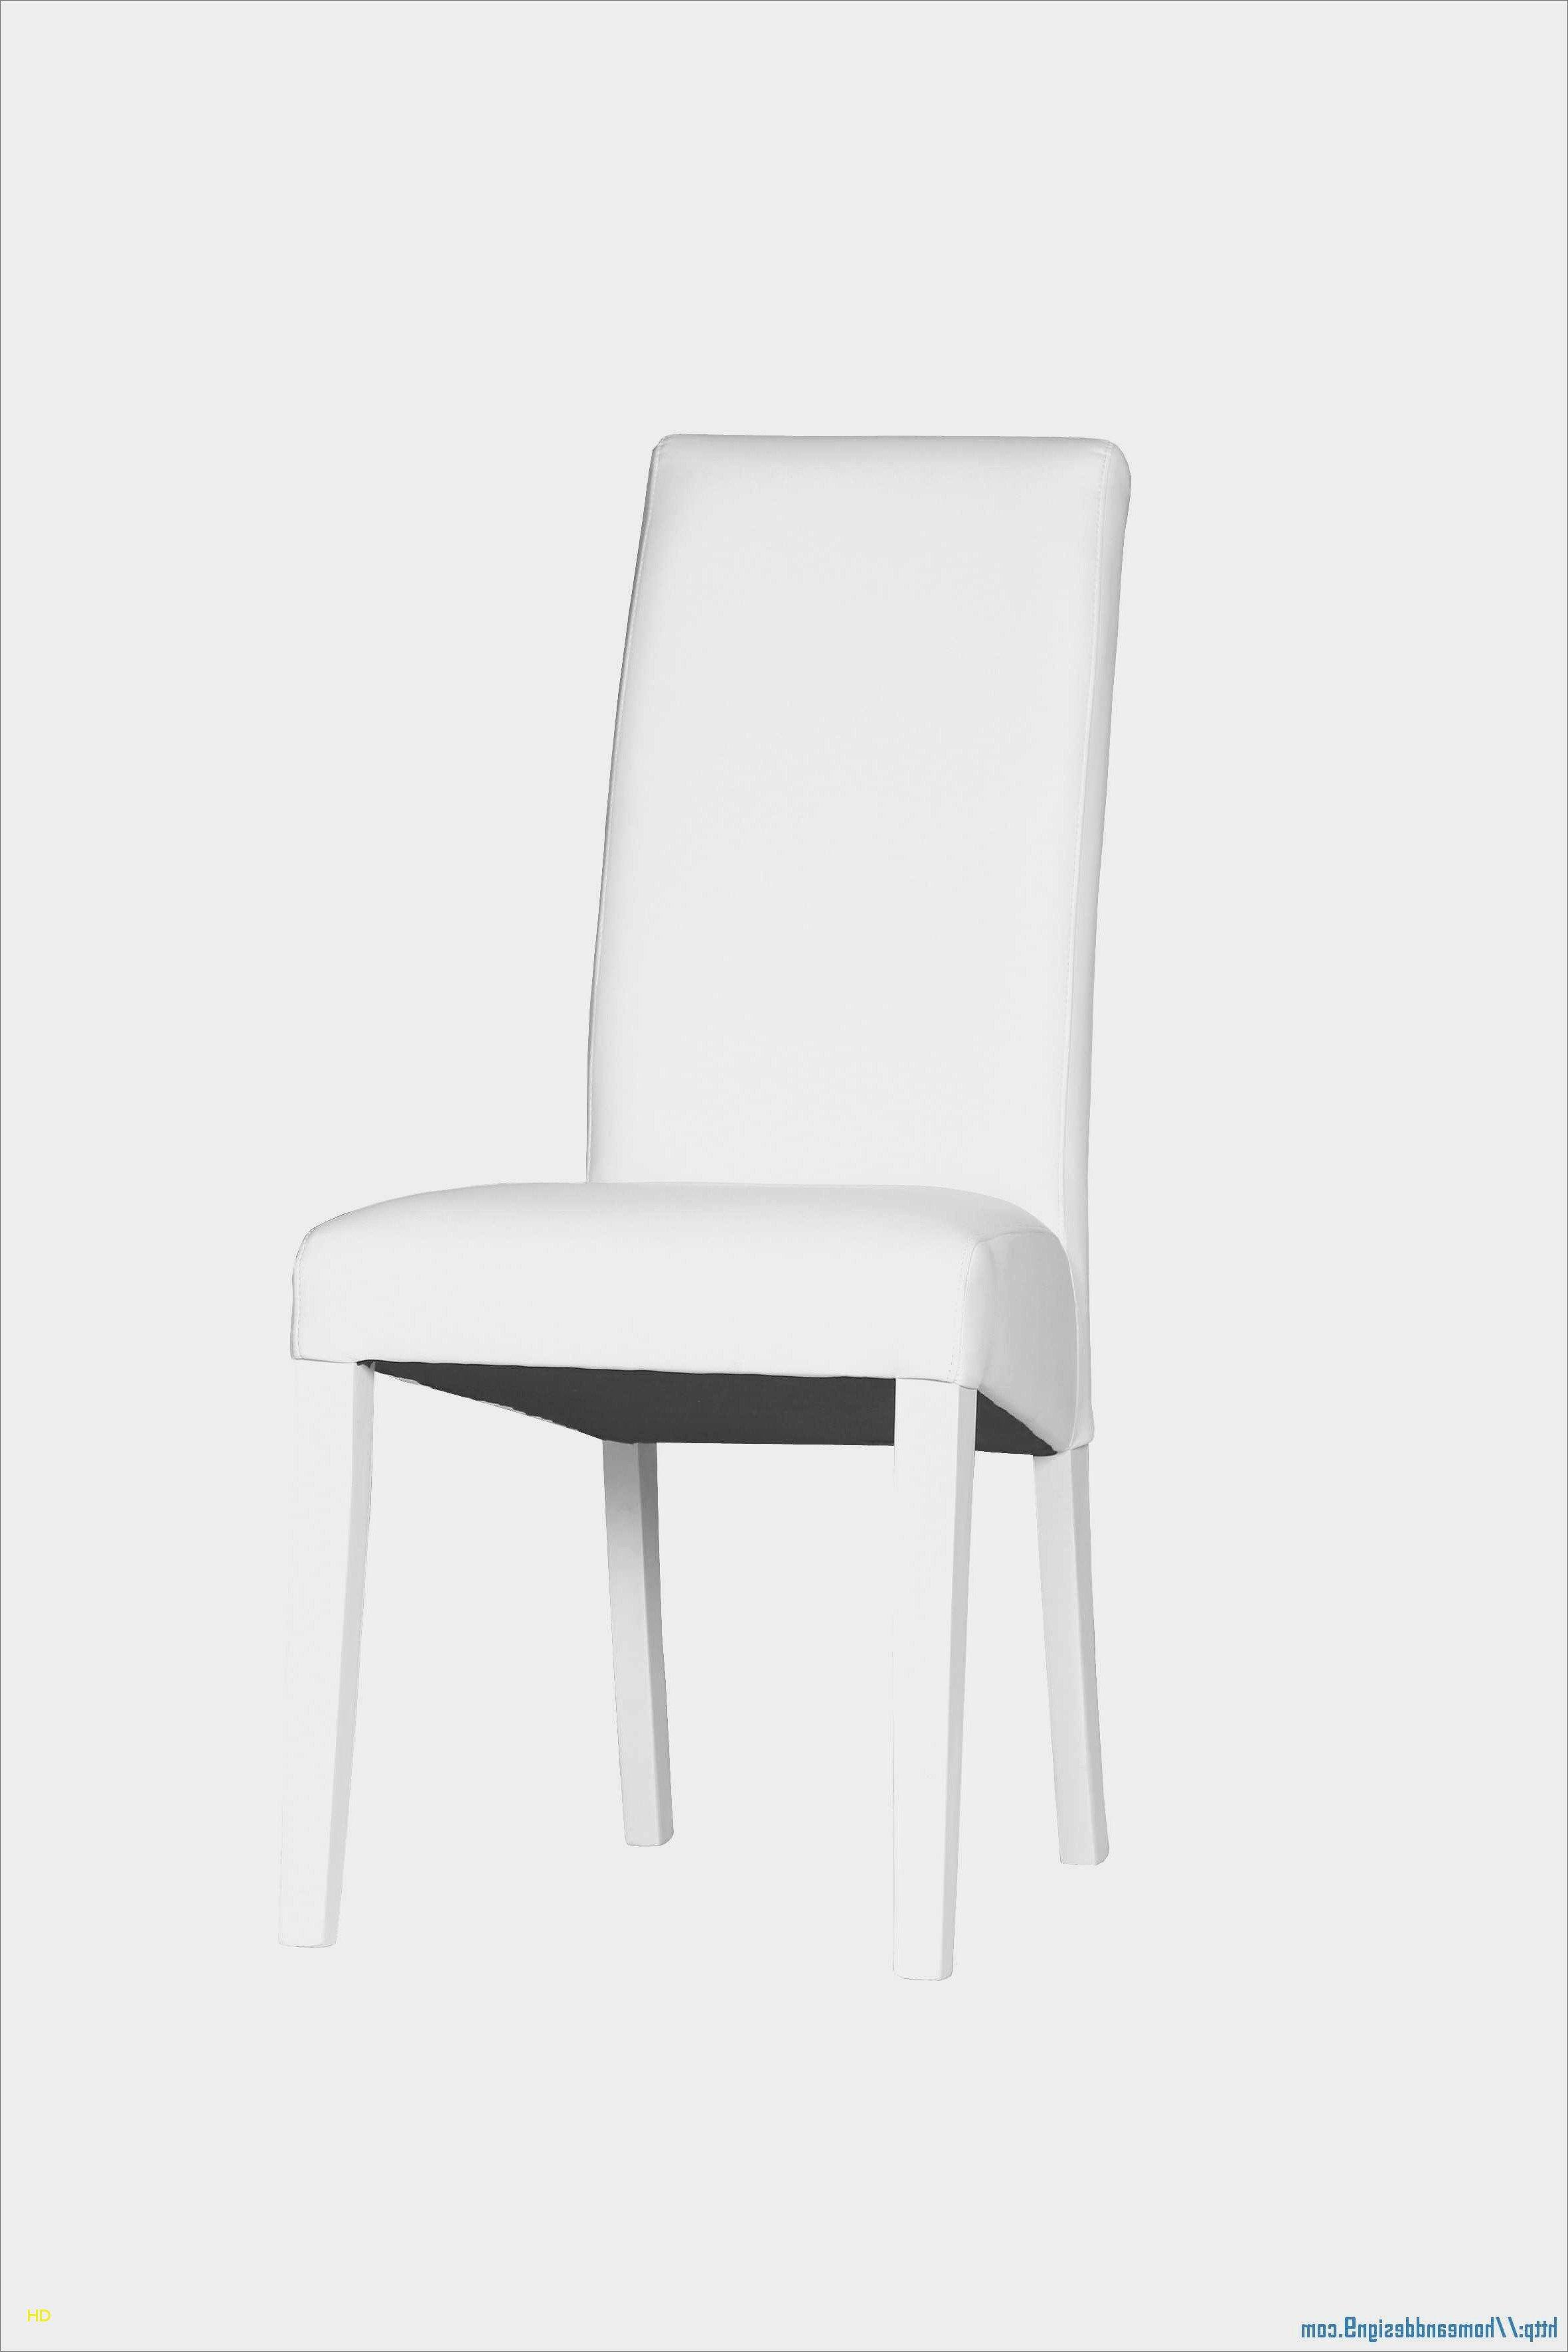 Rehausseur De Lit Ikea Bel Rehausseur Chaise Ikea Nouveau Chaise Ikea Cuisine Interior Design